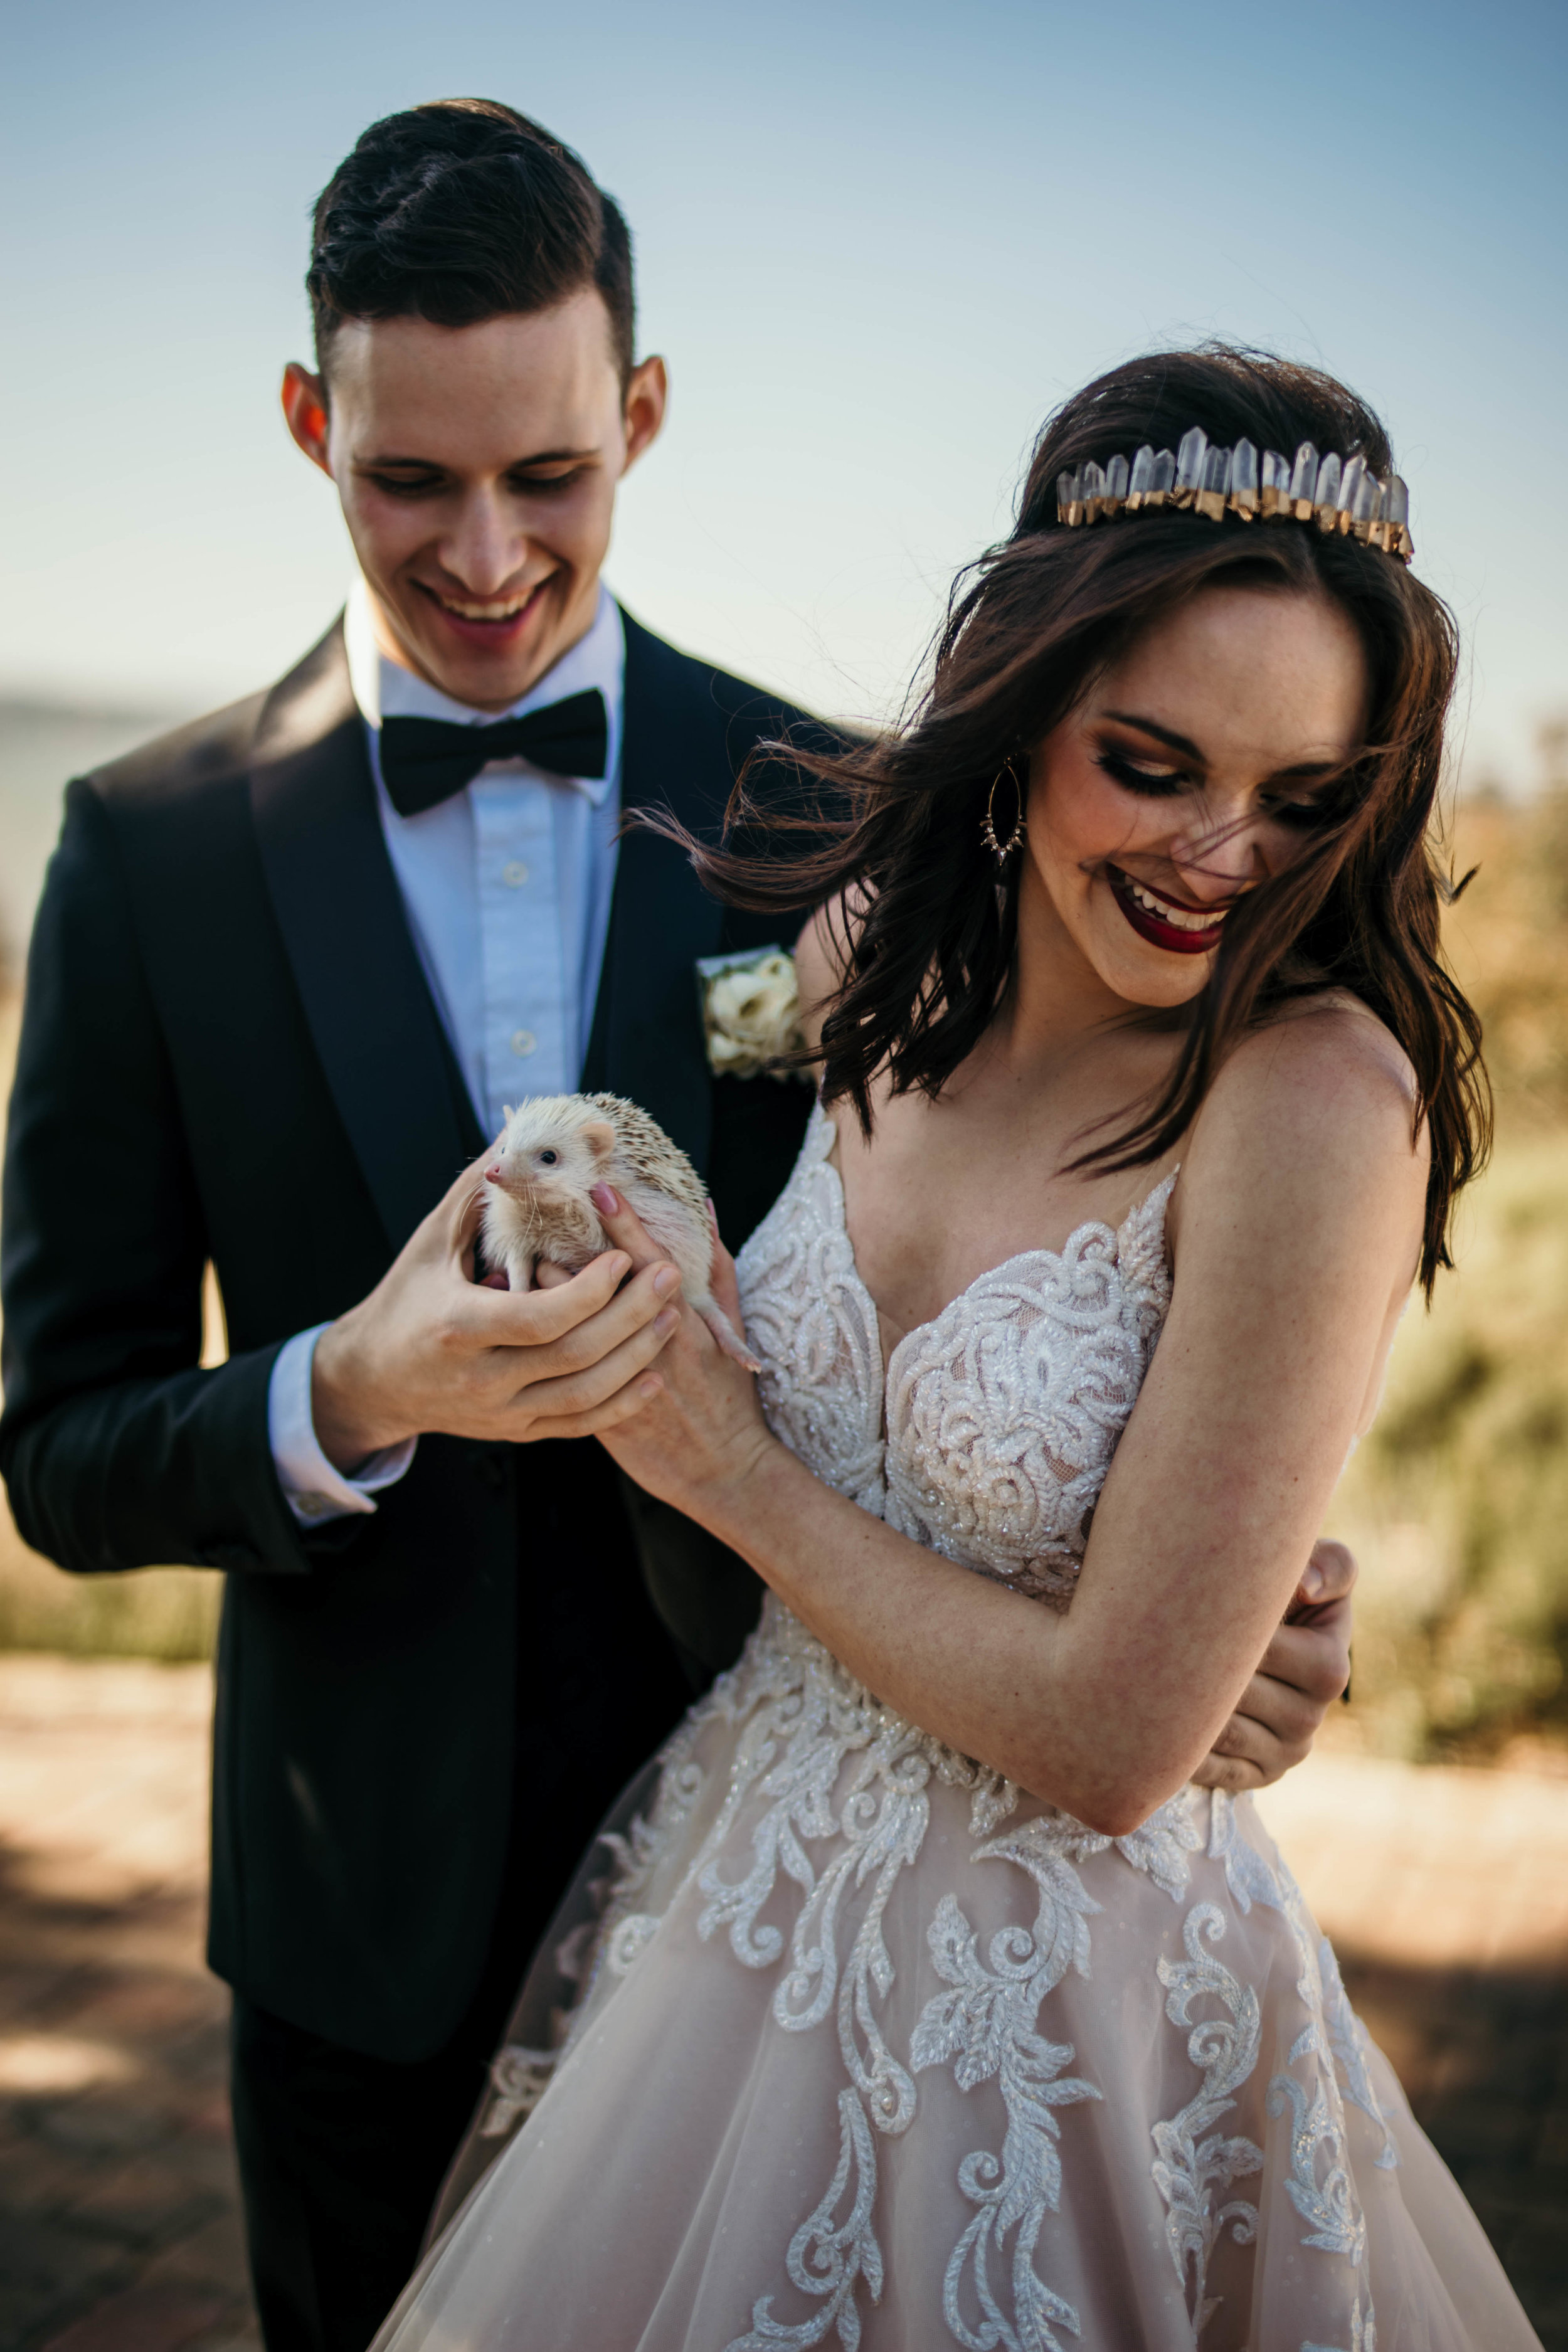 Austin Wedding Videographer - Dolls for Dolls (131 of 323).jpg